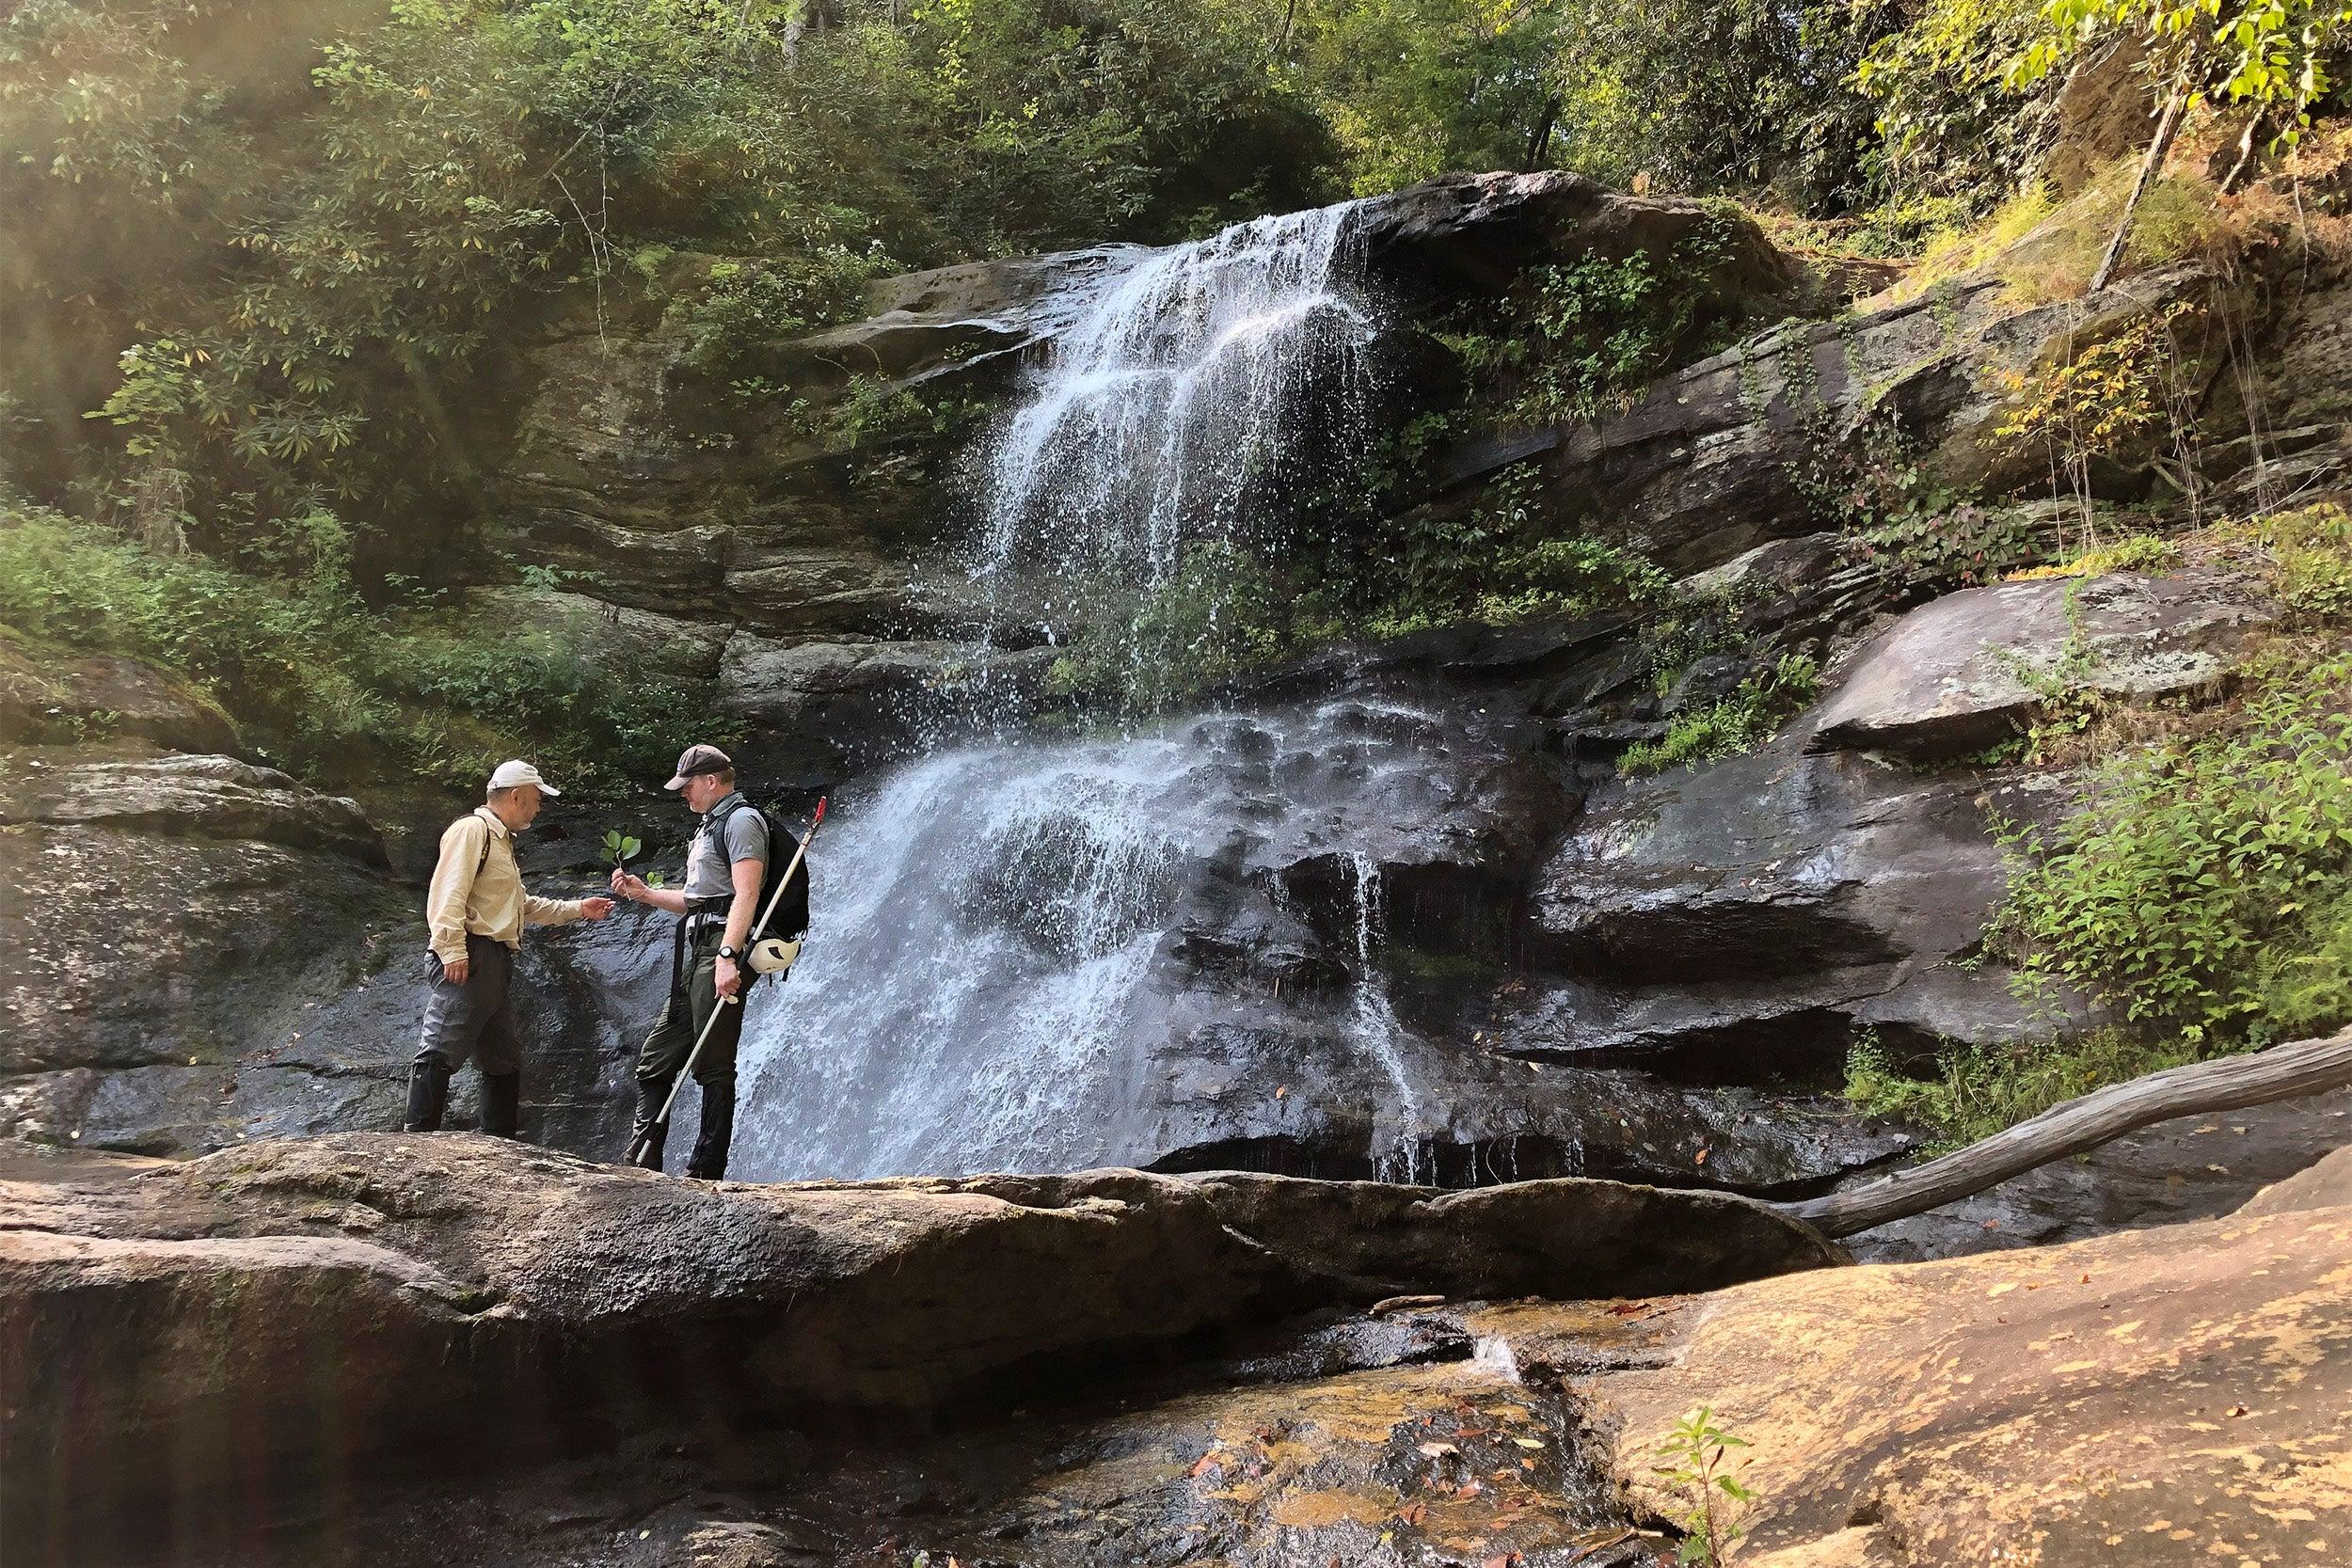 Holcomb Creek Falls in Chattahoochee National Forest in Rabun County, Georgia.